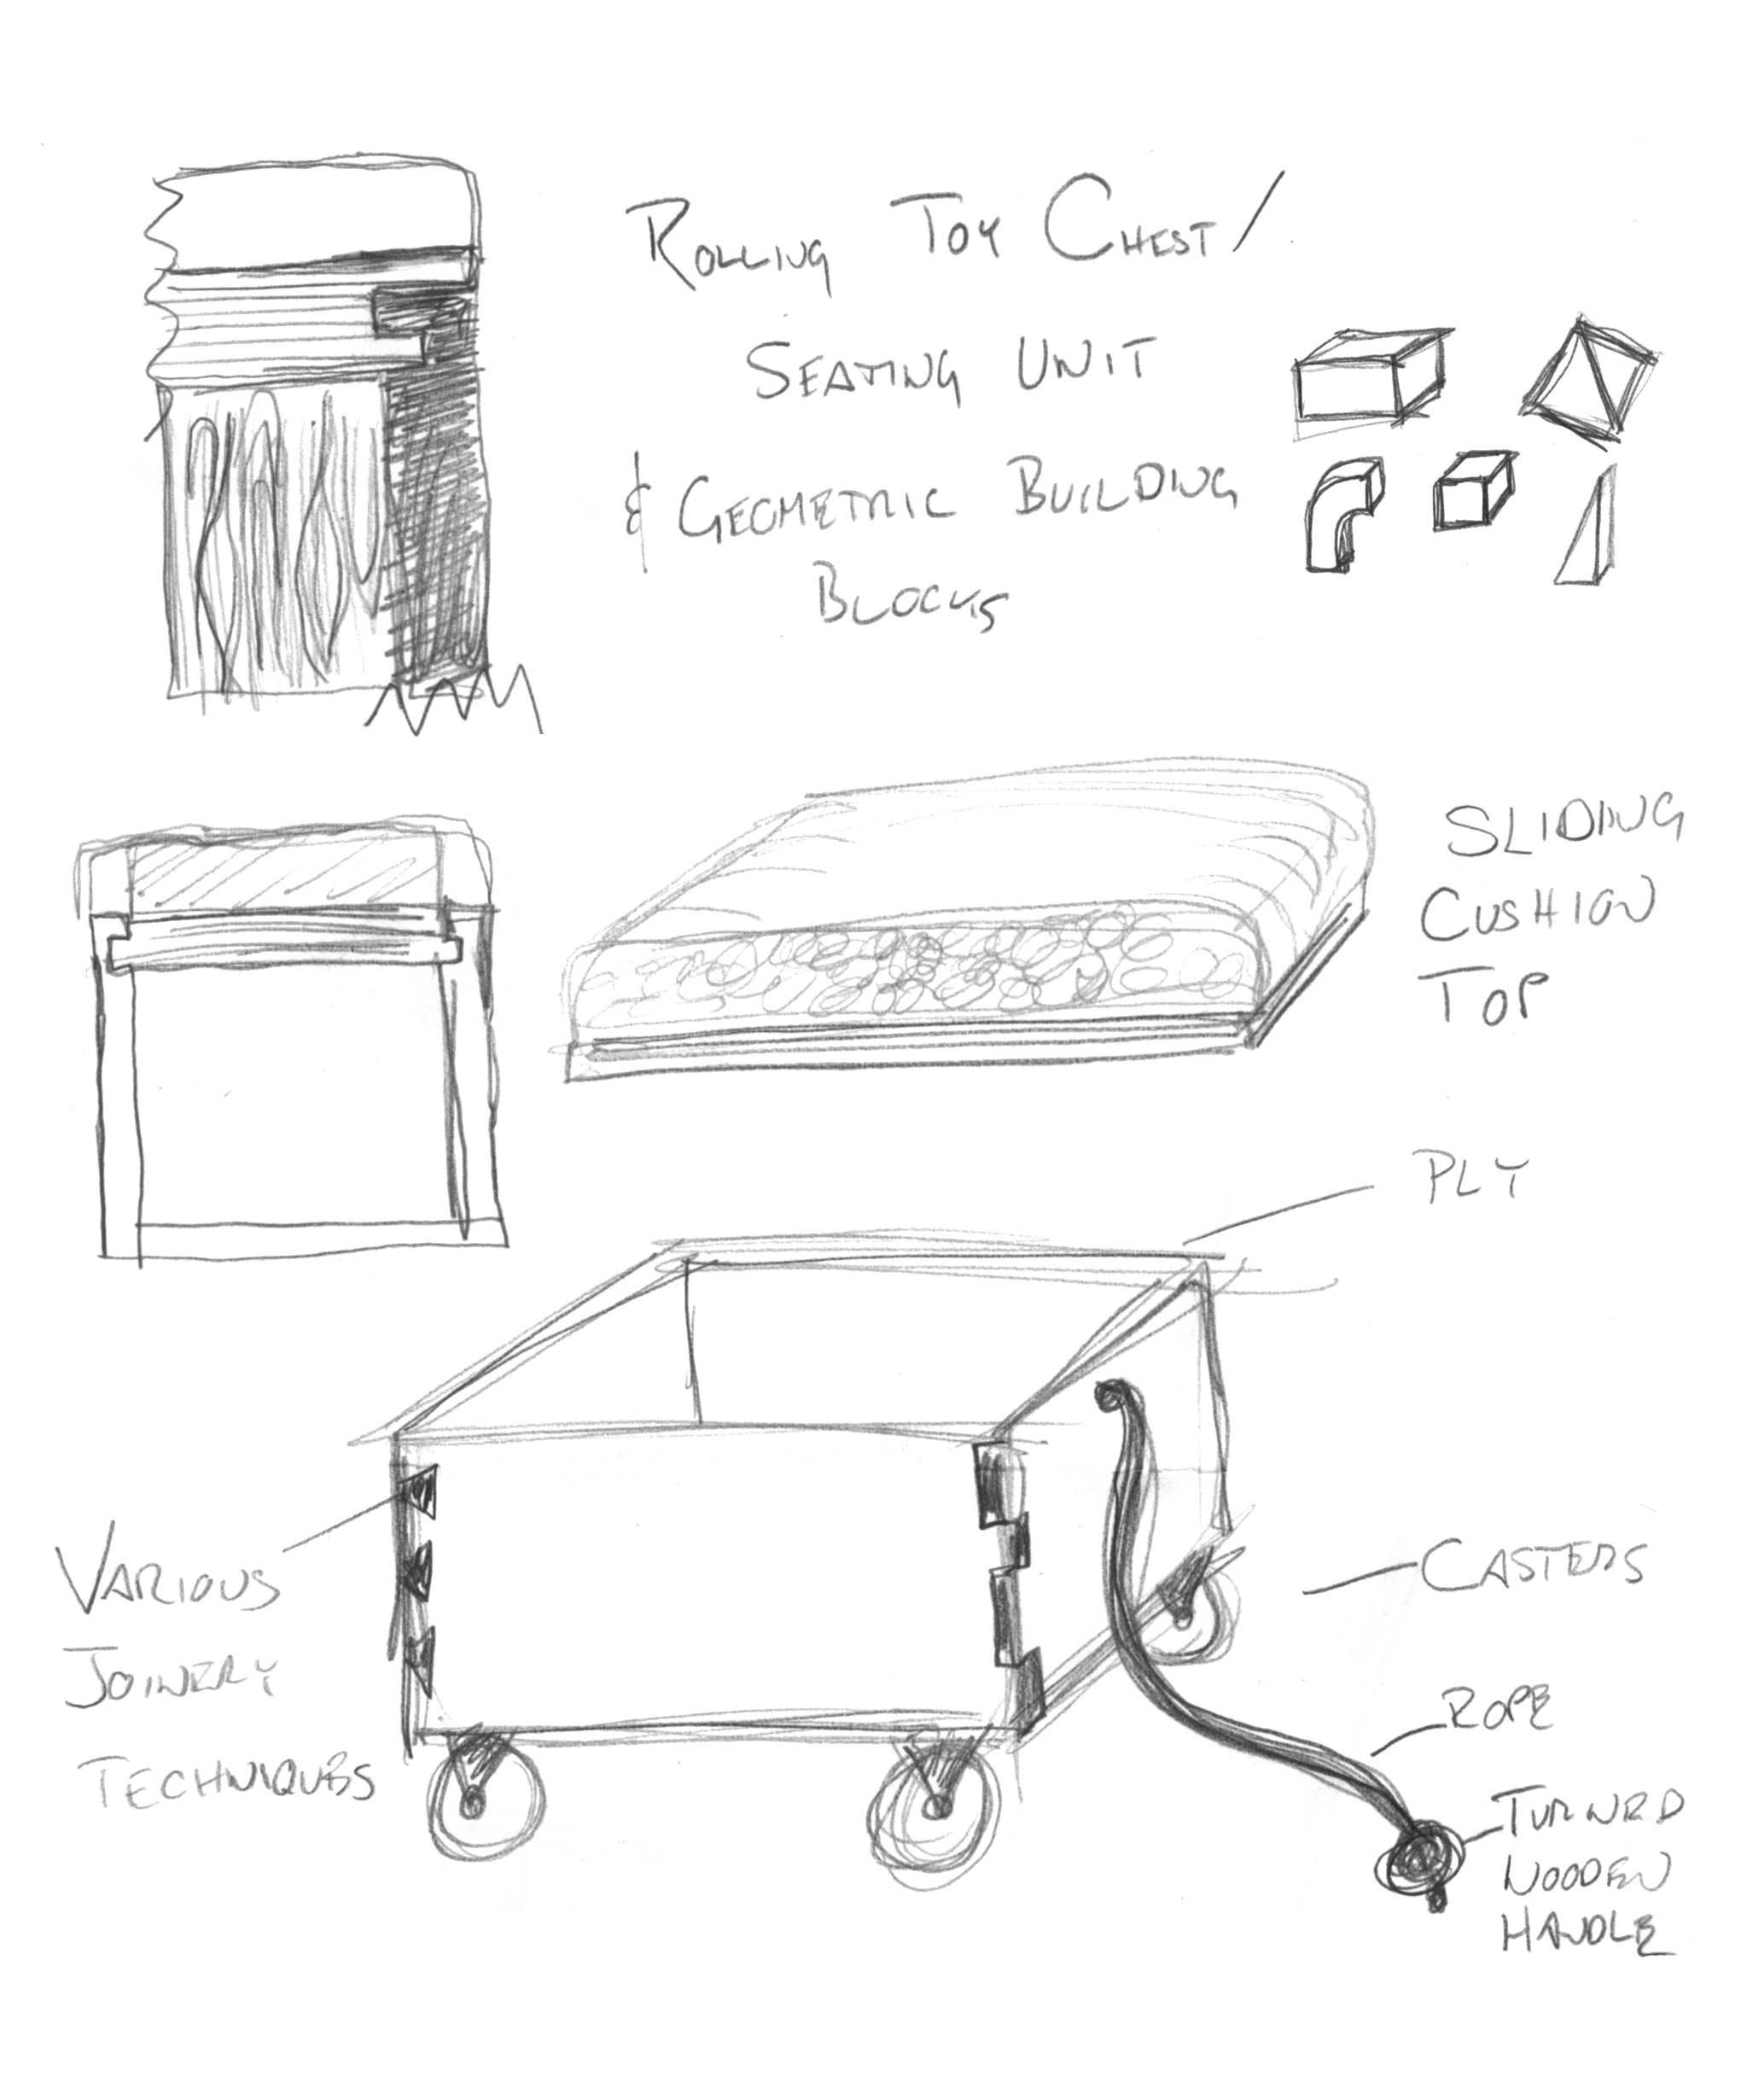 Toy Chest Sketch_4